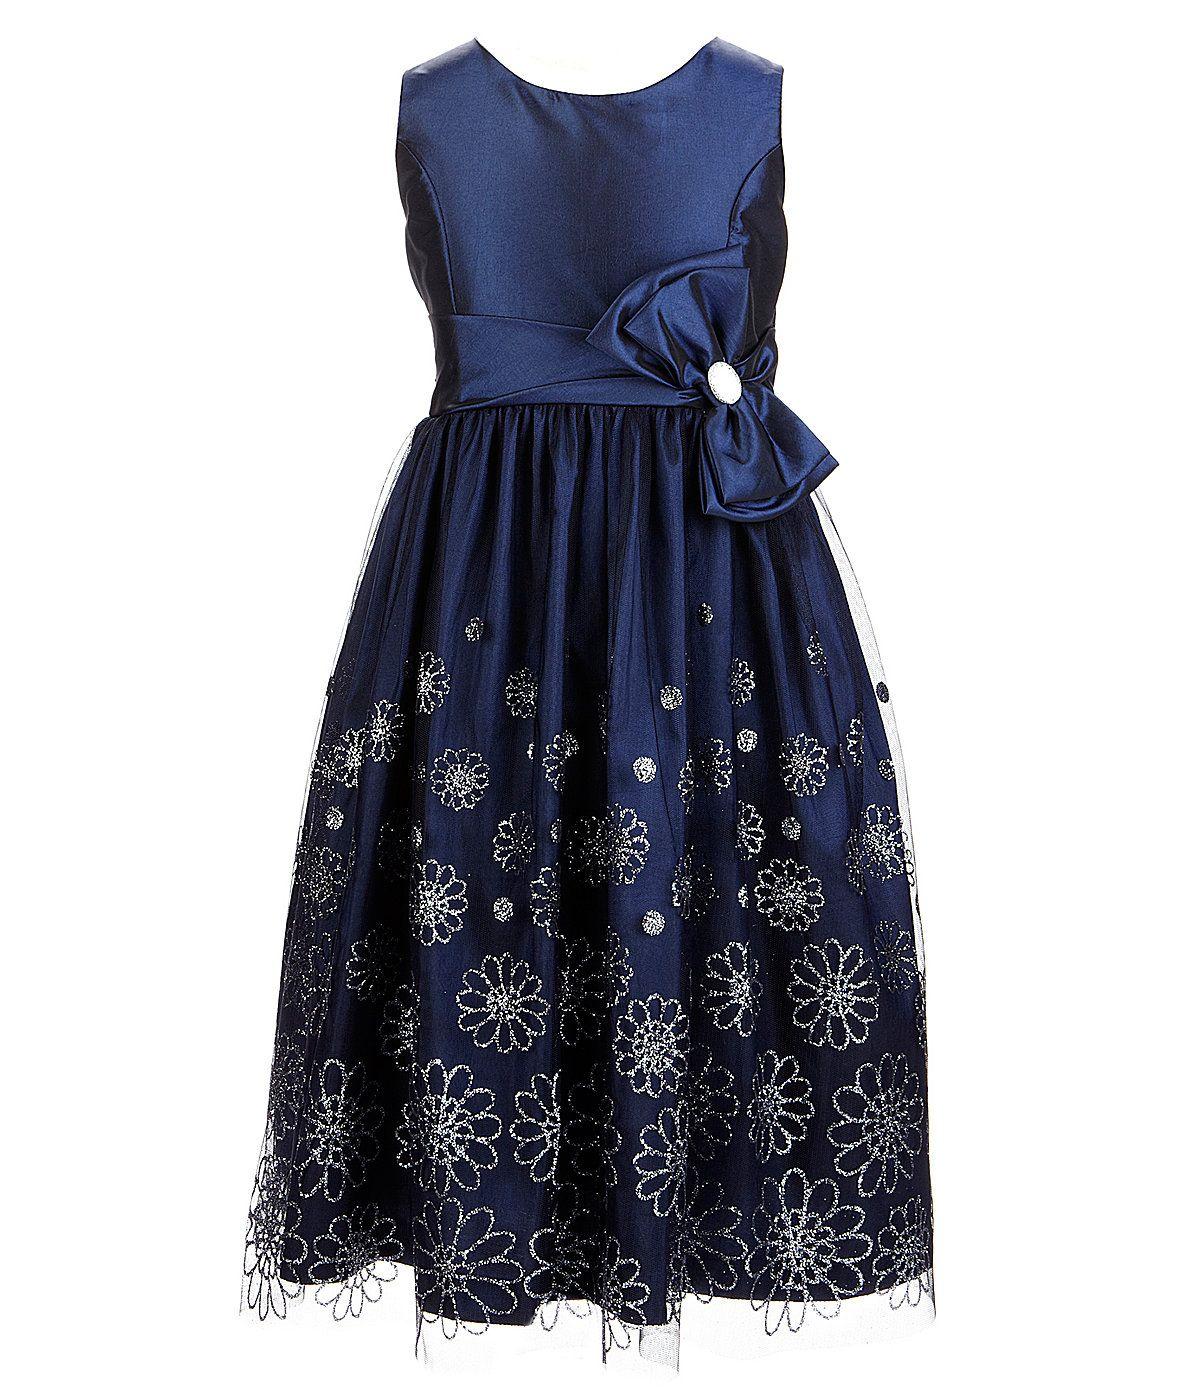 Jayne Copeland 7-12 Velvet Bolero & Flower-Accented Dress Set | Dillards.com